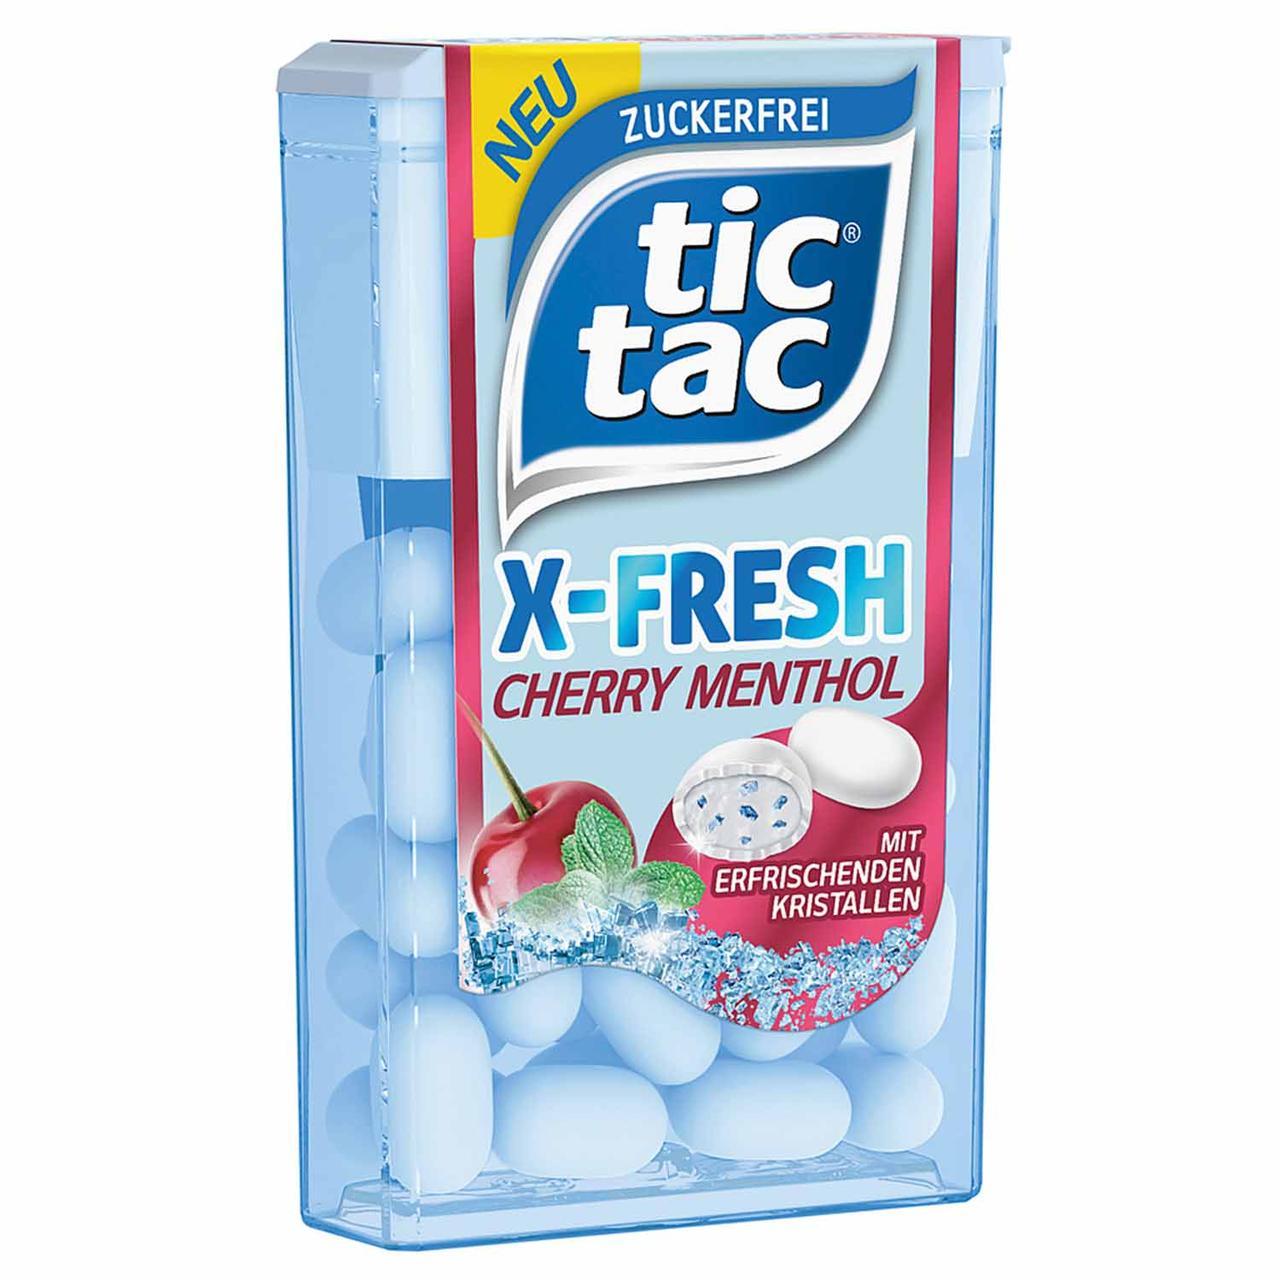 Драже Tic Tac Xfresh Cherry Mentol 16 g